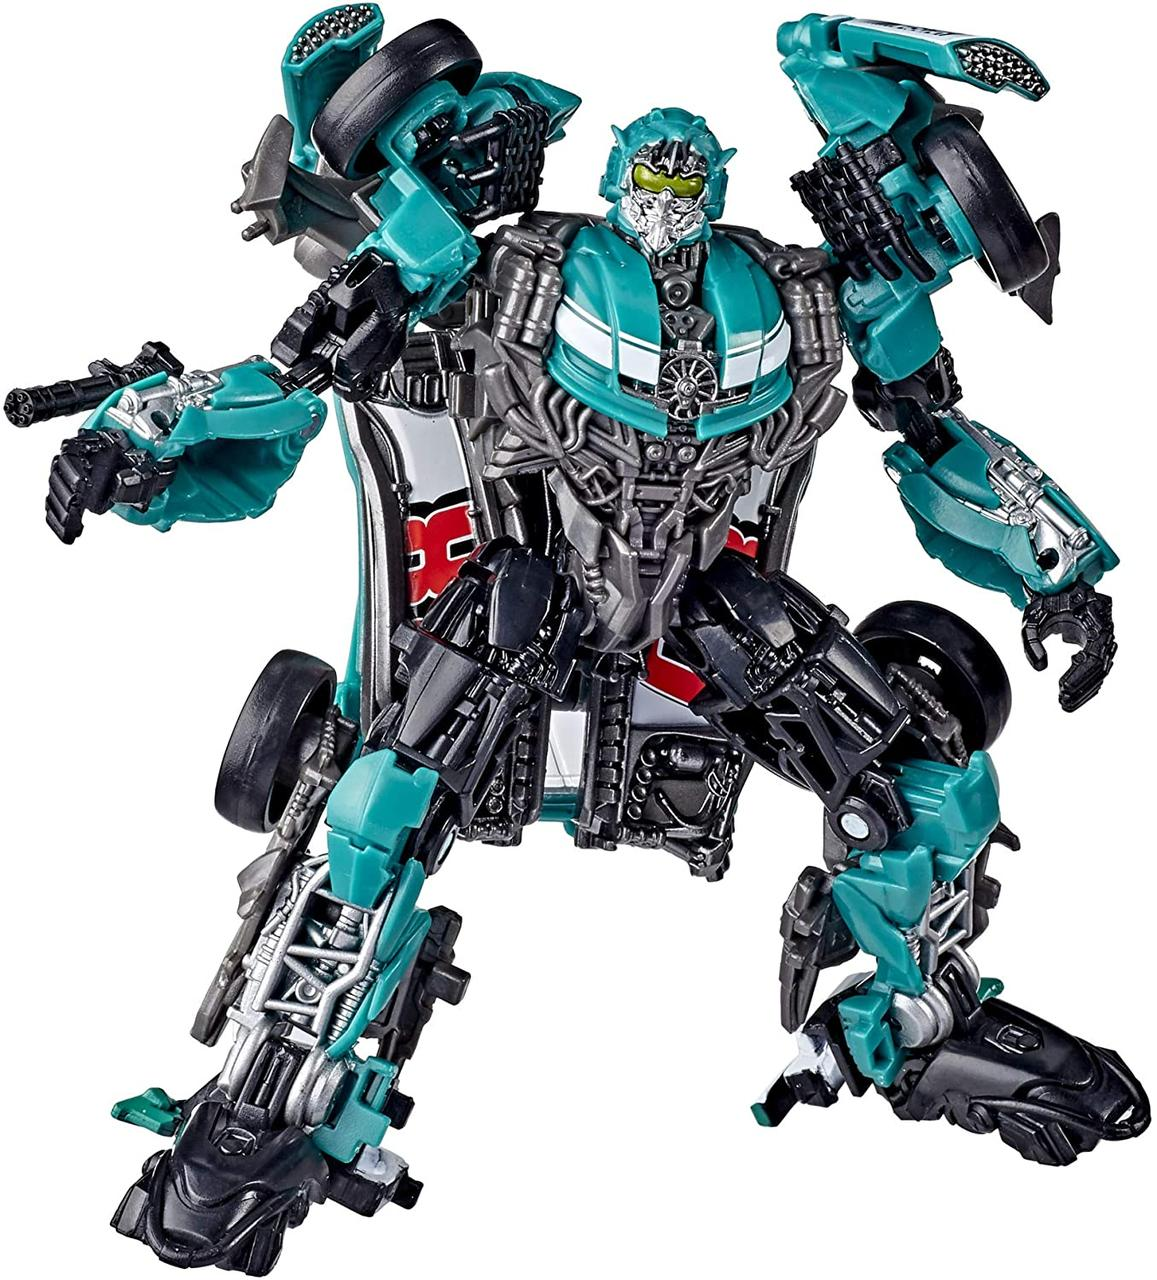 Трансформер Роудбастер Студио Серия 58 Transformers Studio Series 58 Roadbuster